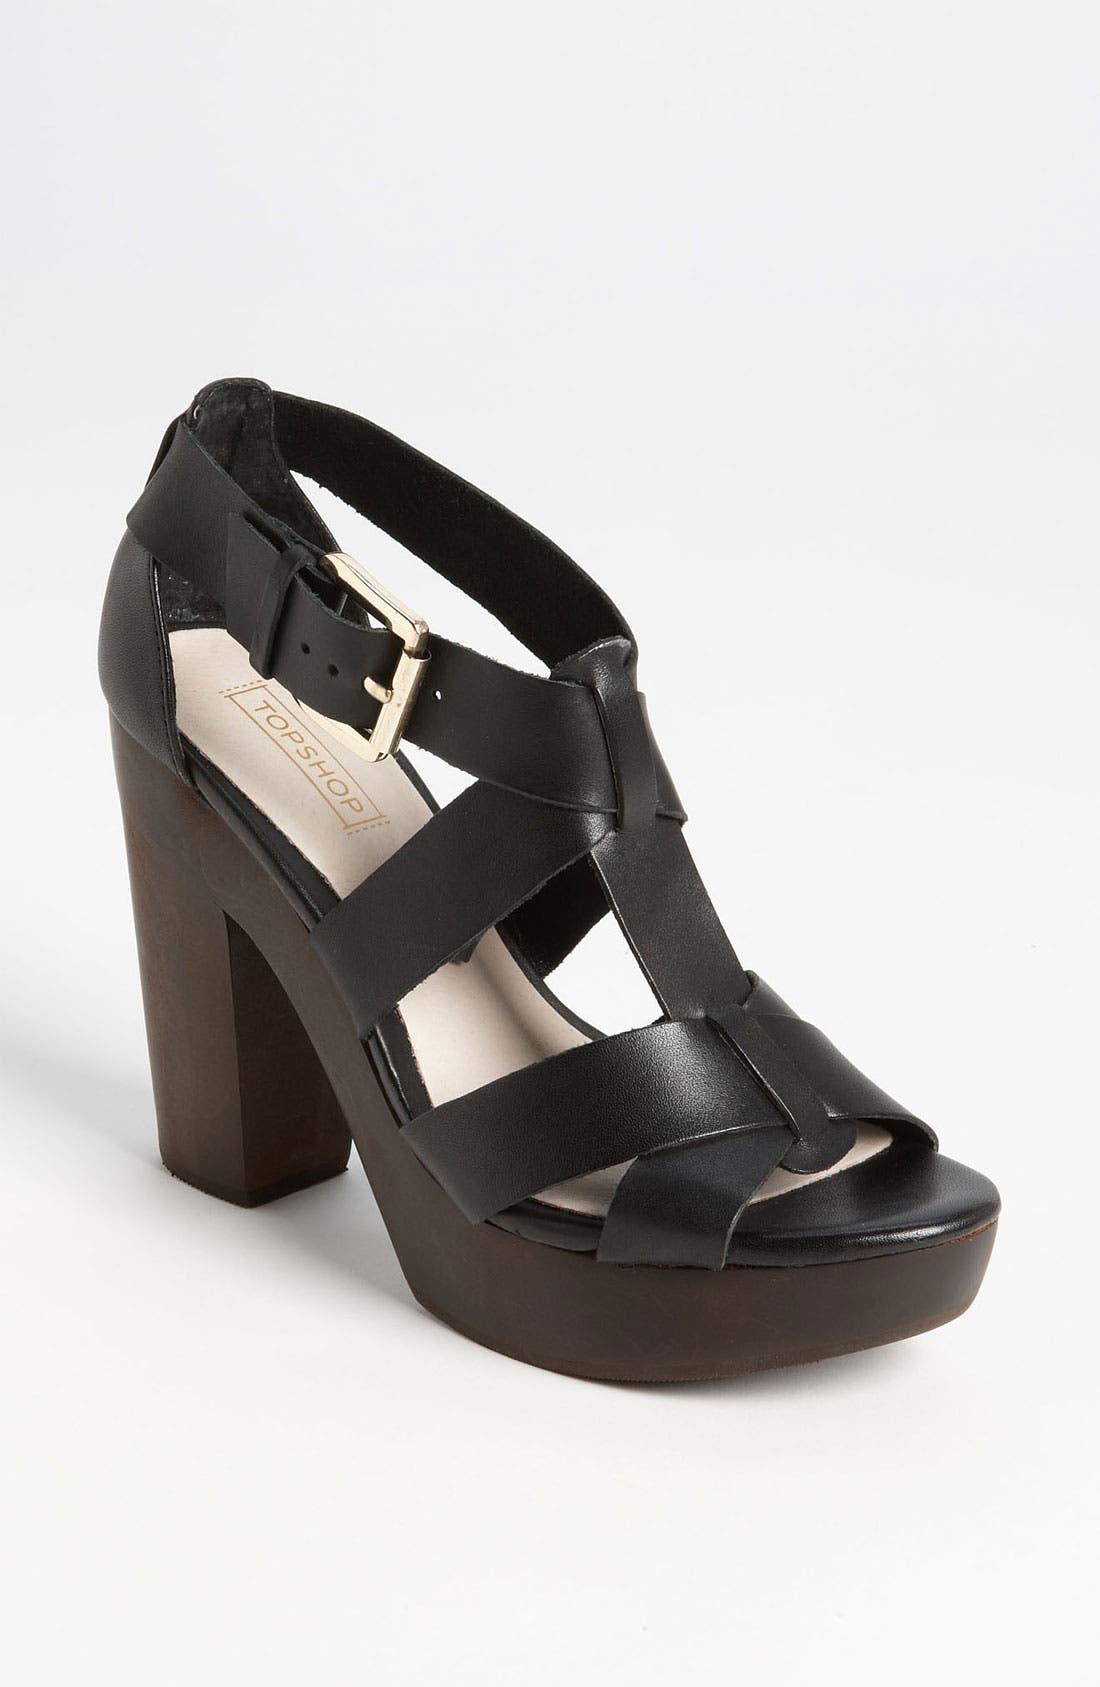 Alternate Image 1 Selected - Topshop 'Right-Wood' Sandal